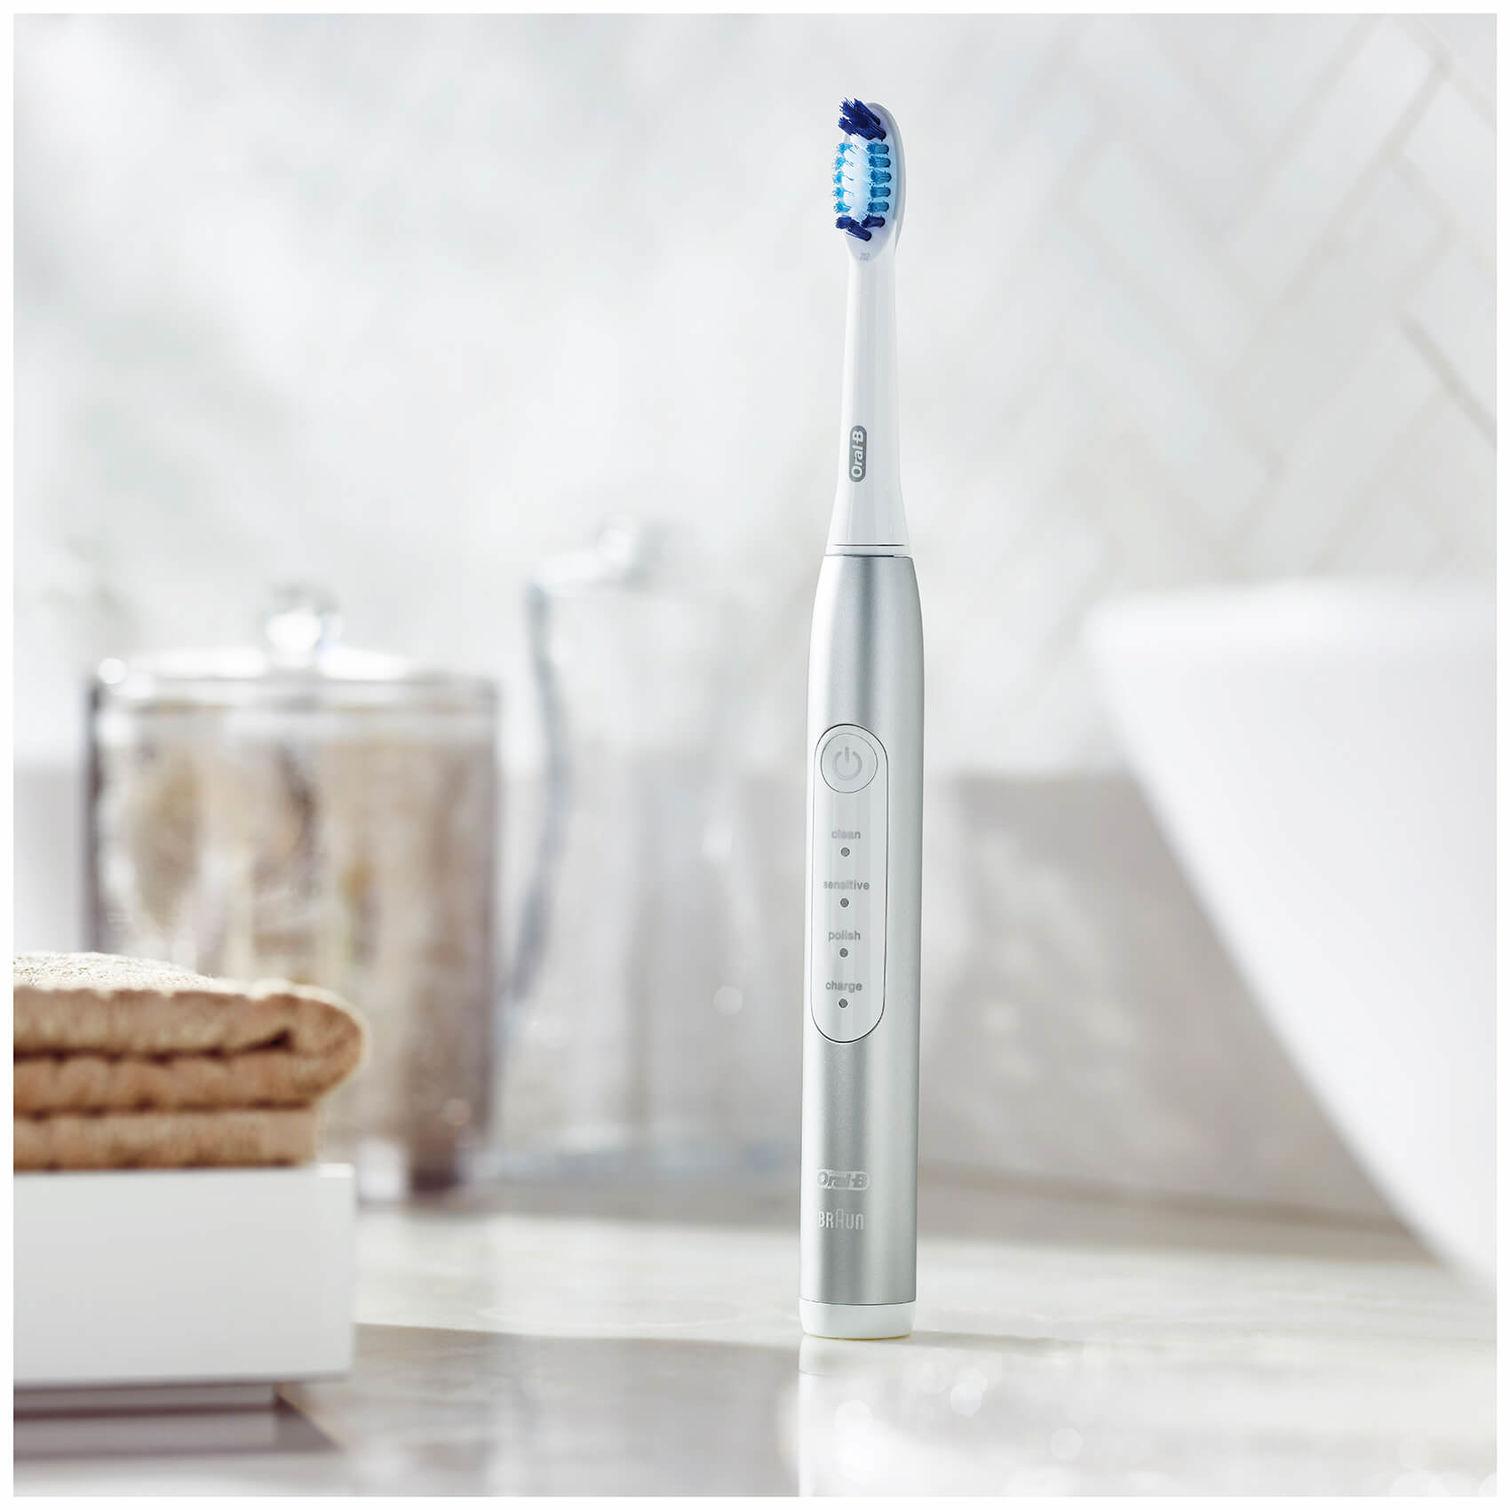 Buy Braun Oral-B Pulsonic Slim Luxe 4100 toothbrush platinum 498cdb965a776